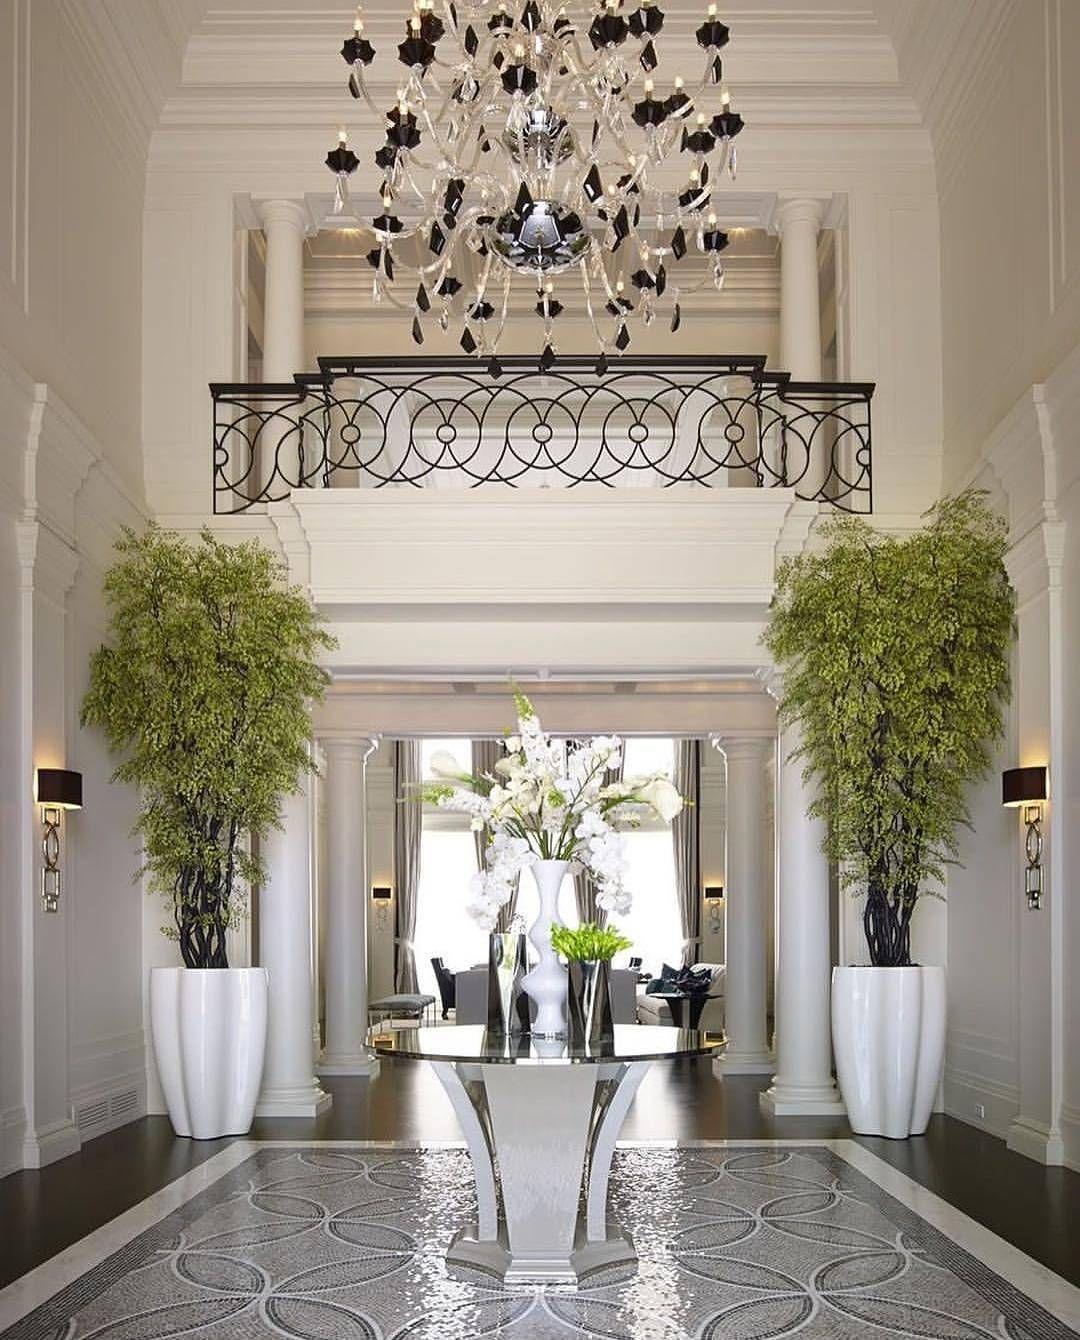 Everything lc home mansions homes luxury decor interior room also design elegante decoracion de unas ideas rh co pinterest